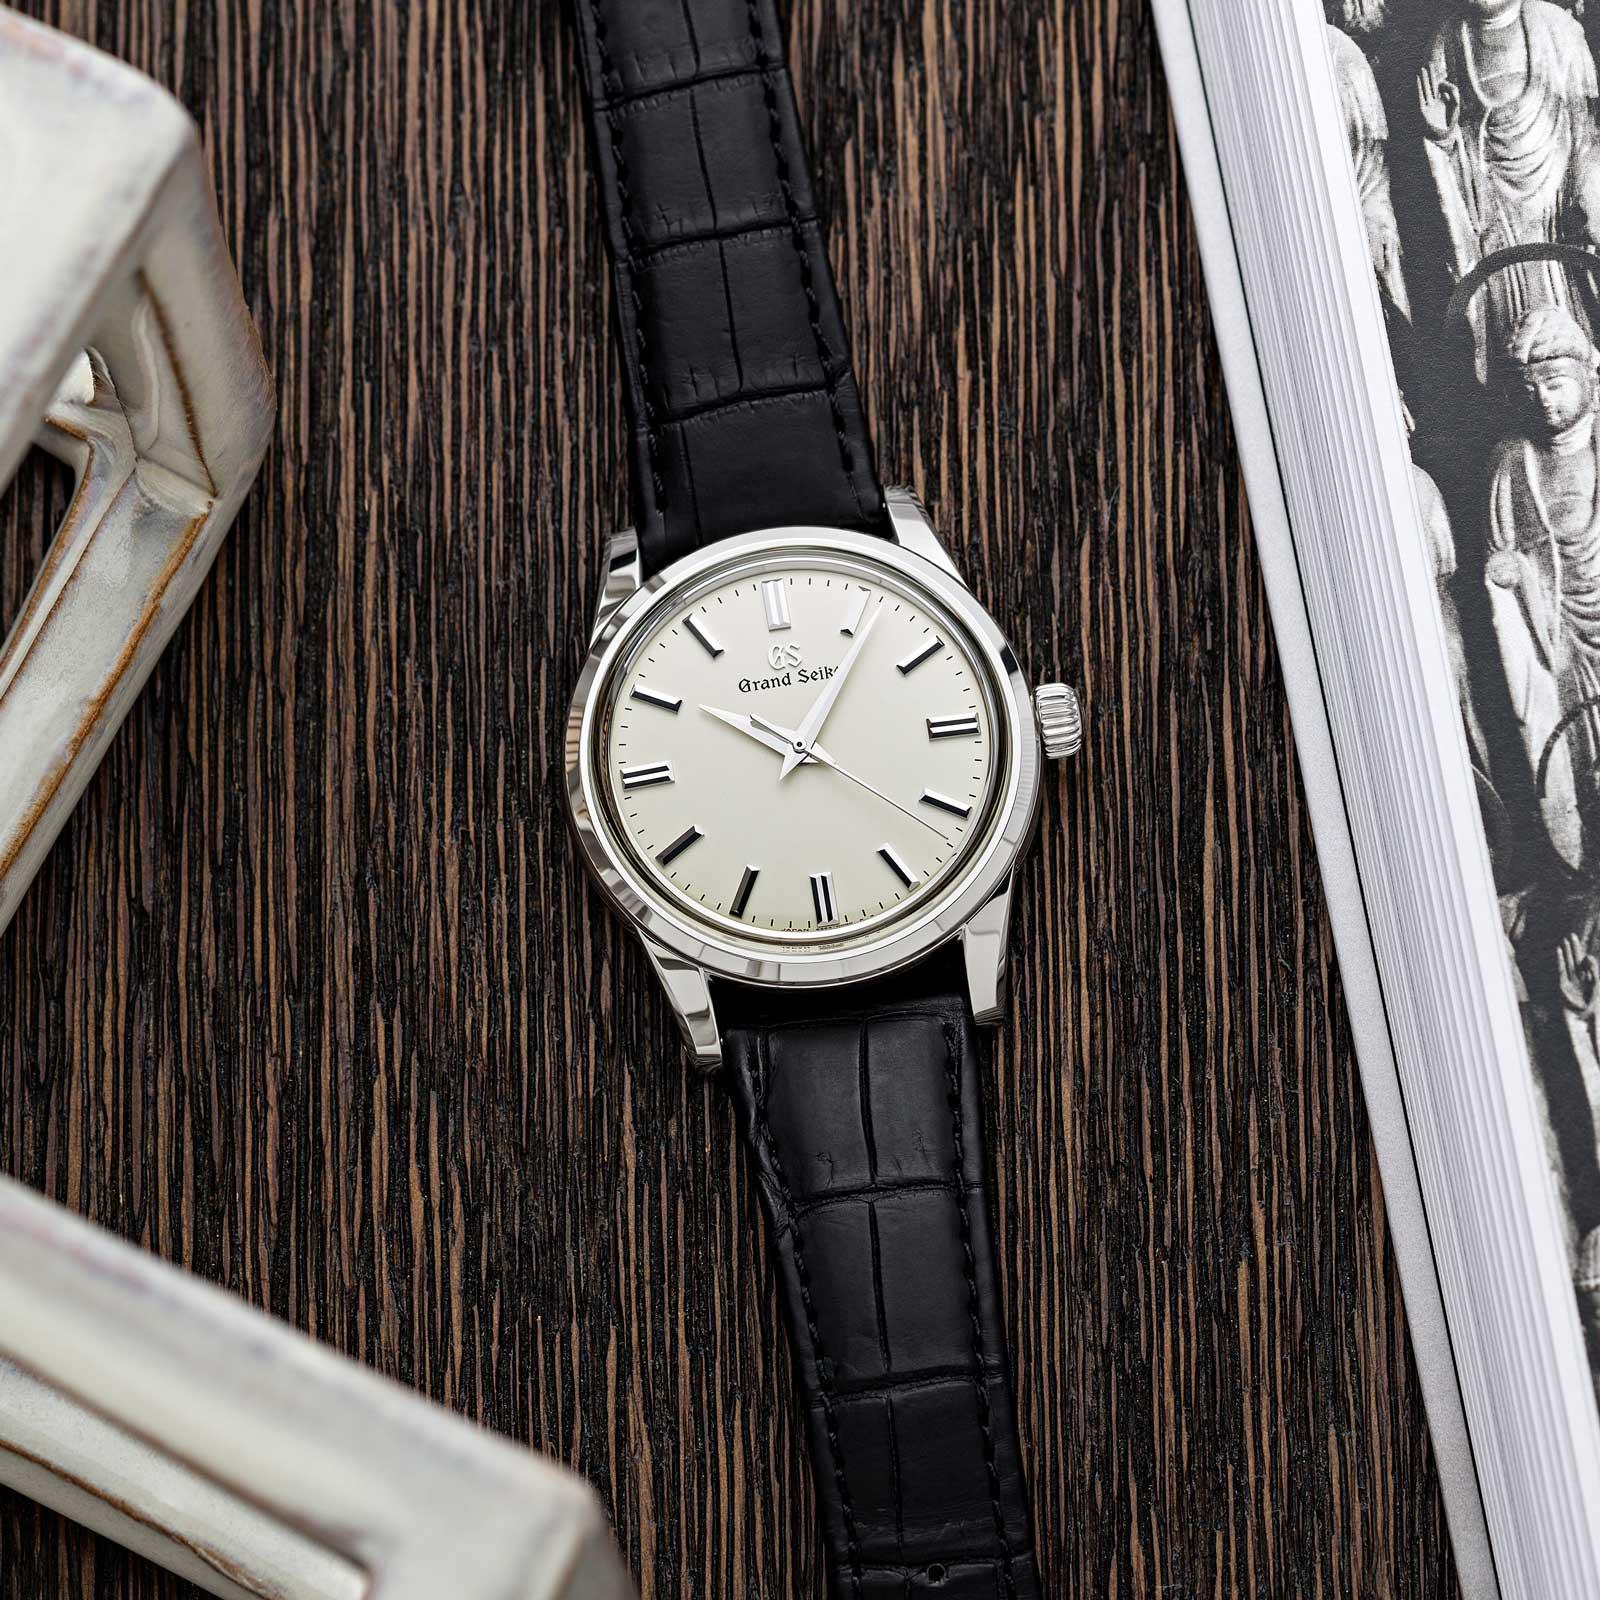 Grand Seiko SBGW231 manual winding luxury men's dress watch.